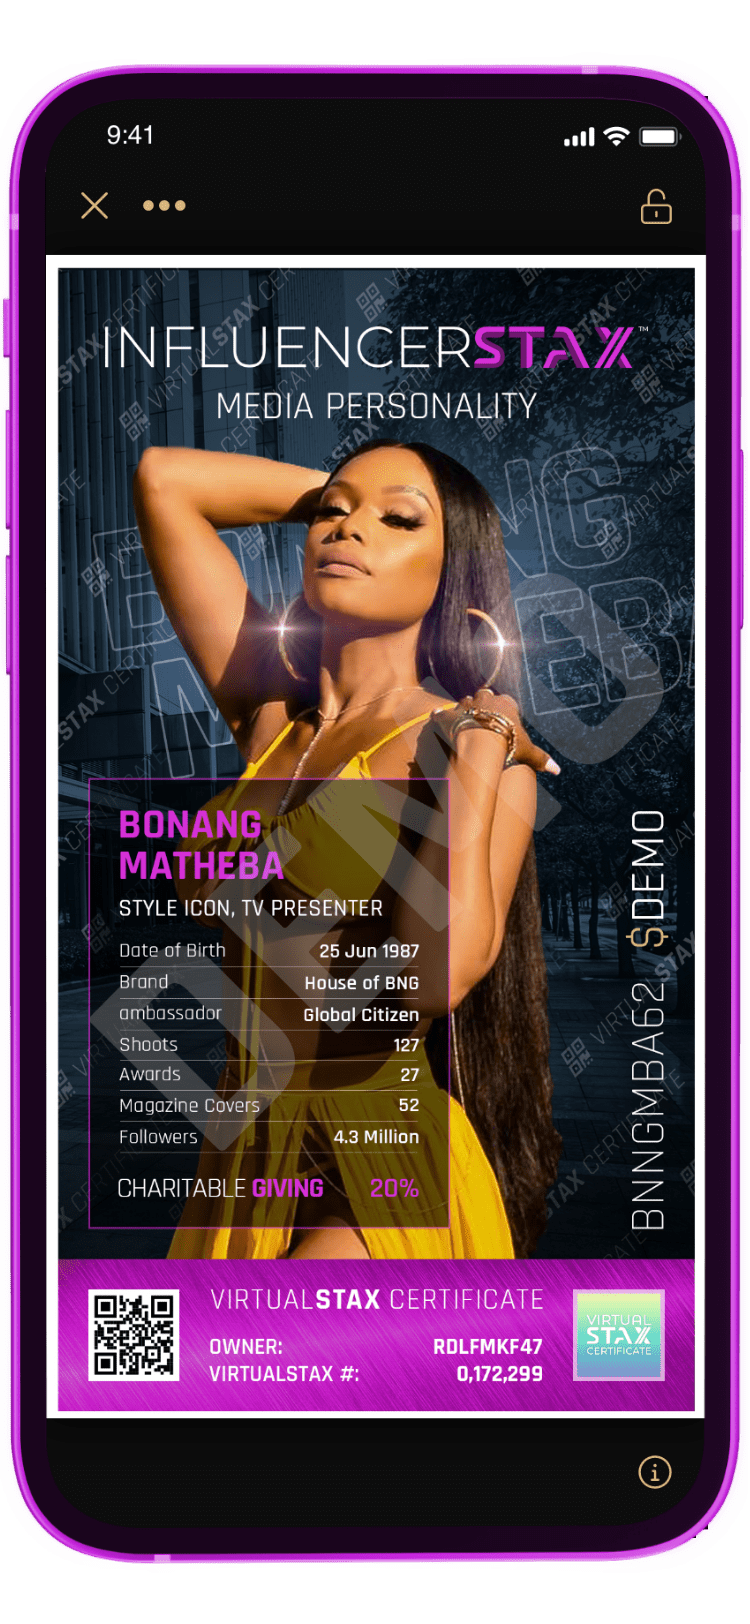 IX App Bonang Matheba